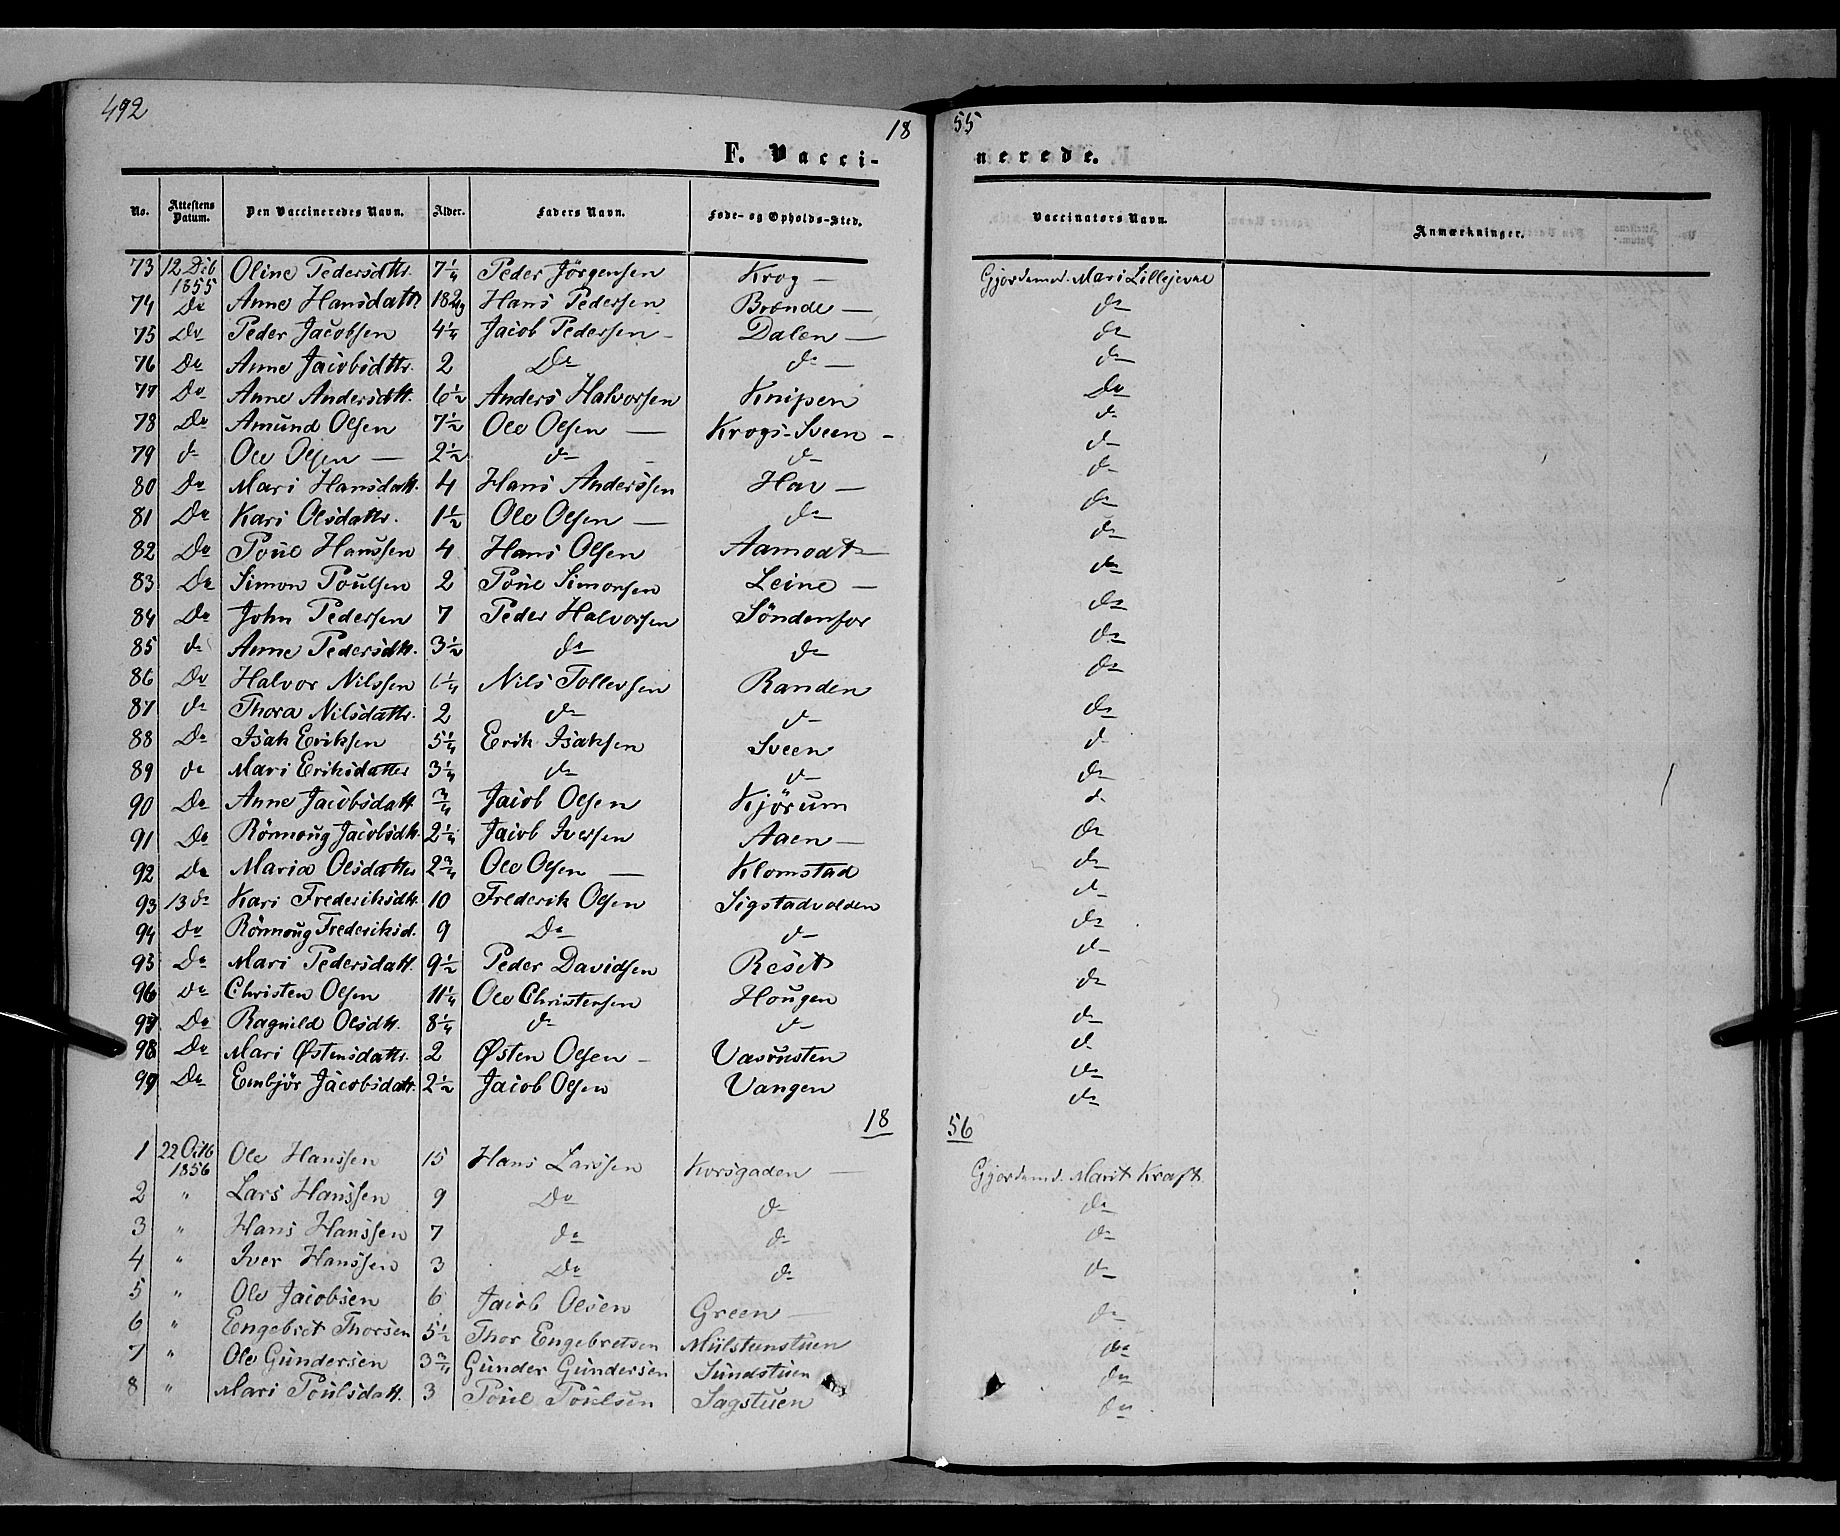 SAH, Nord-Fron prestekontor, Ministerialbok nr. 1, 1851-1864, s. 492